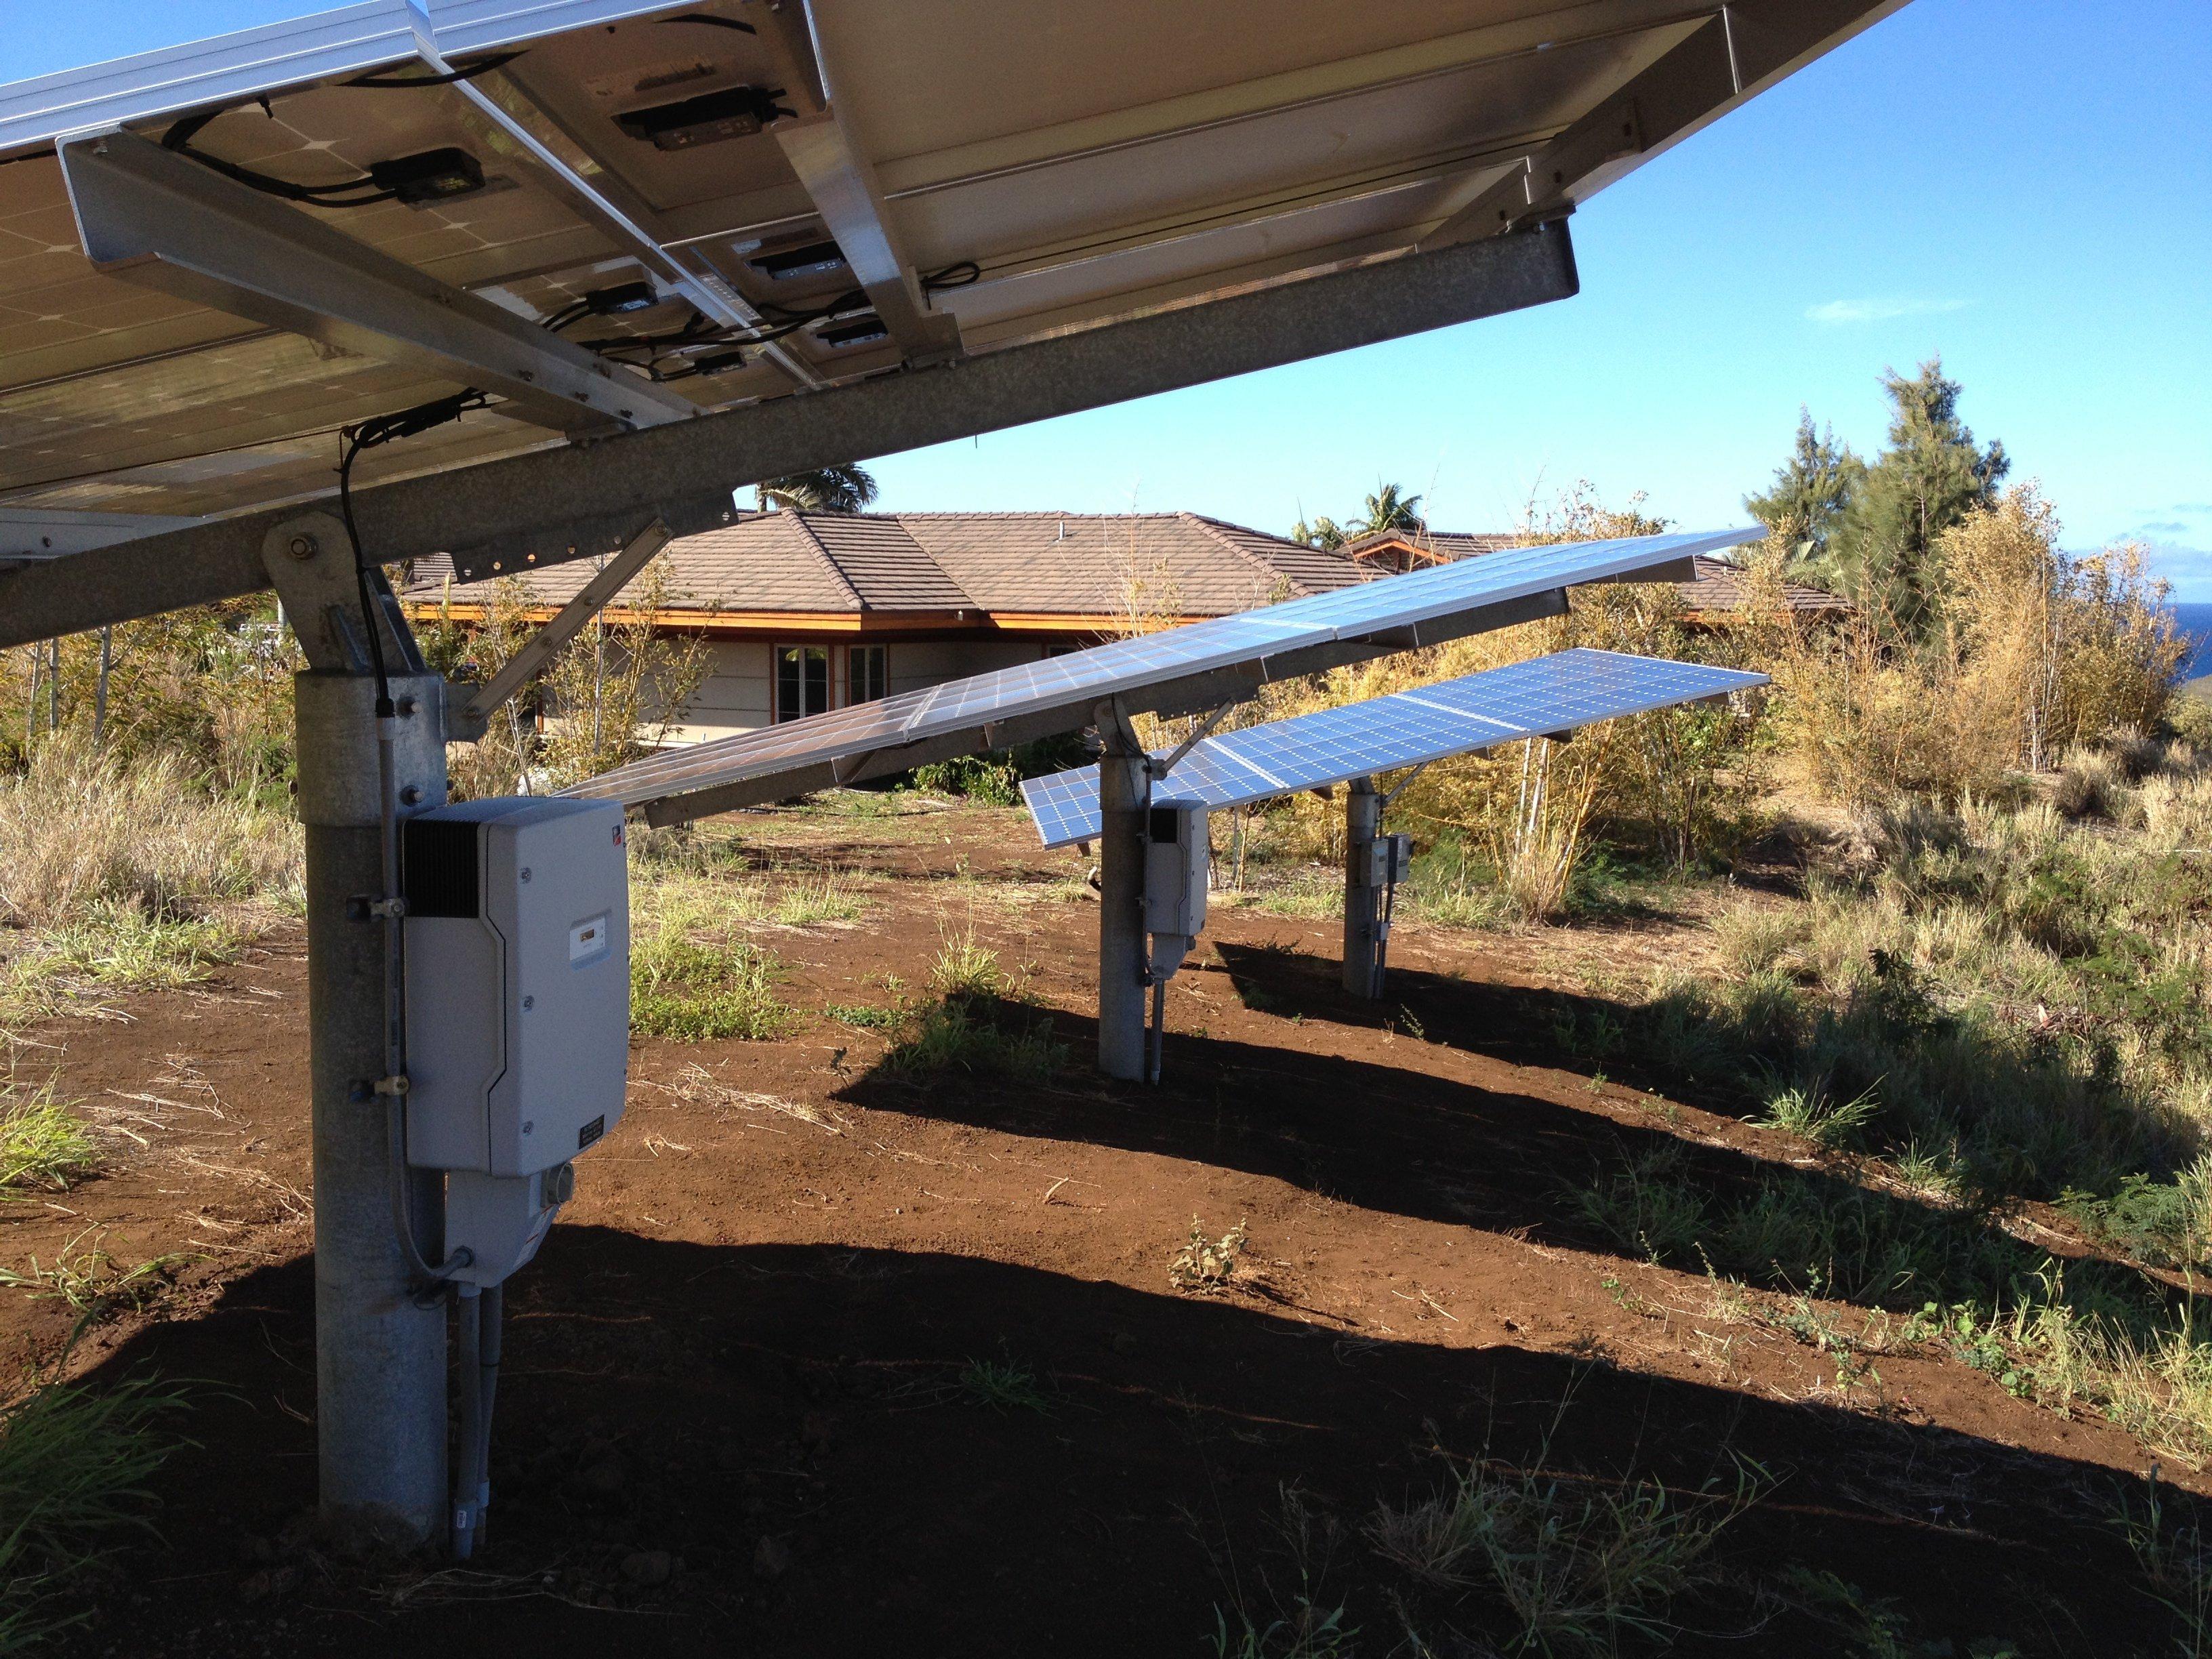 11.856 KW Solar PV system installed on rooftop in Honokaa, HI